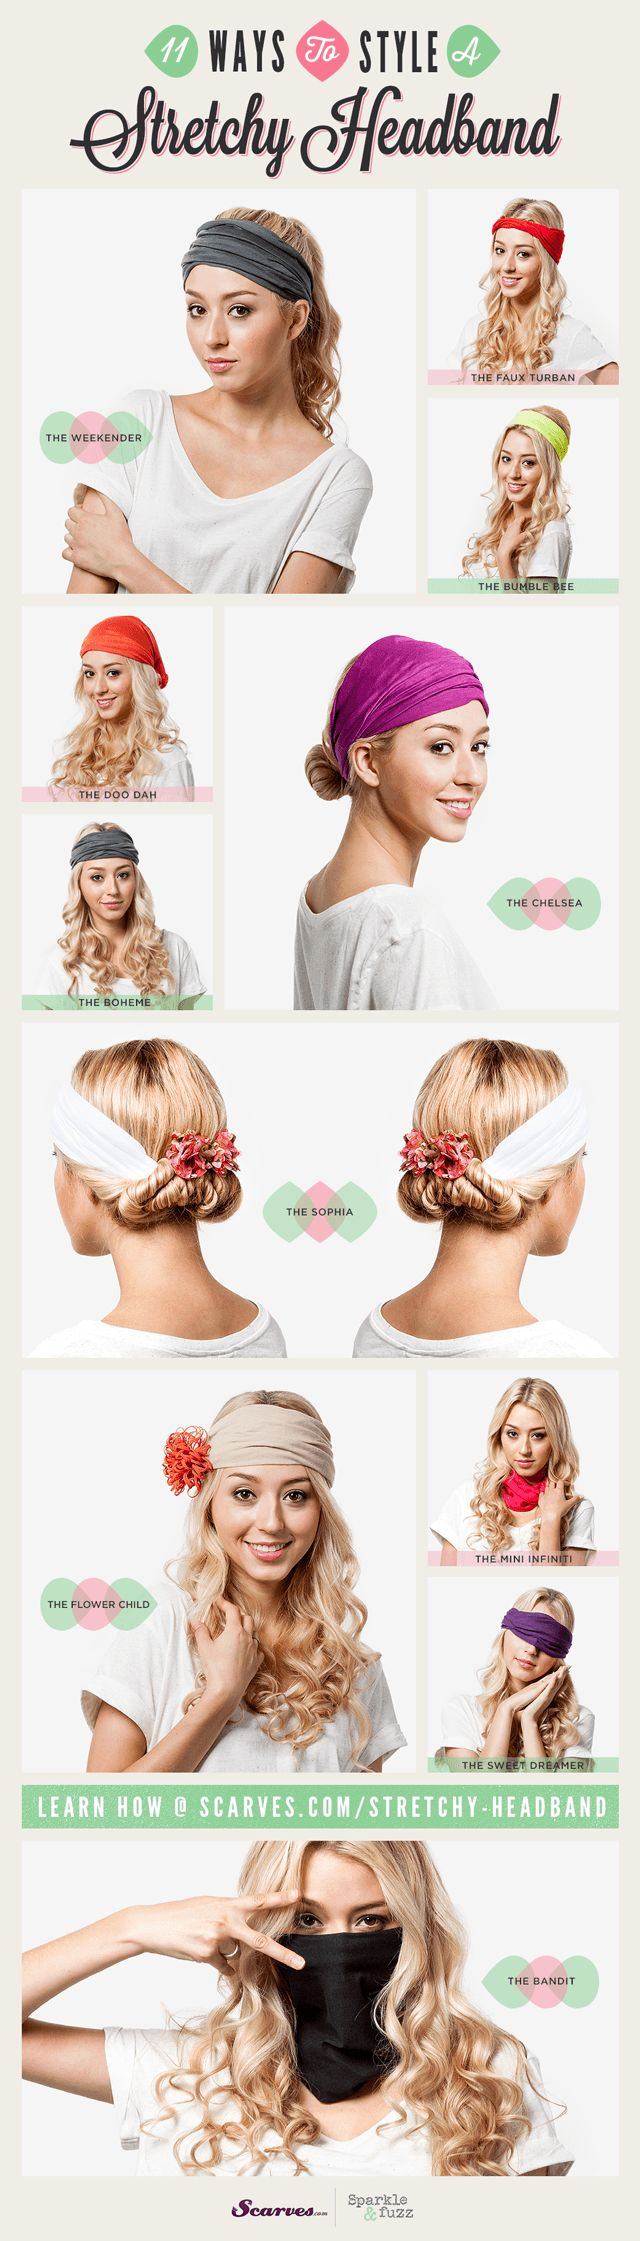 best 25+ stretchy headbands ideas on pinterest | baby hair bands